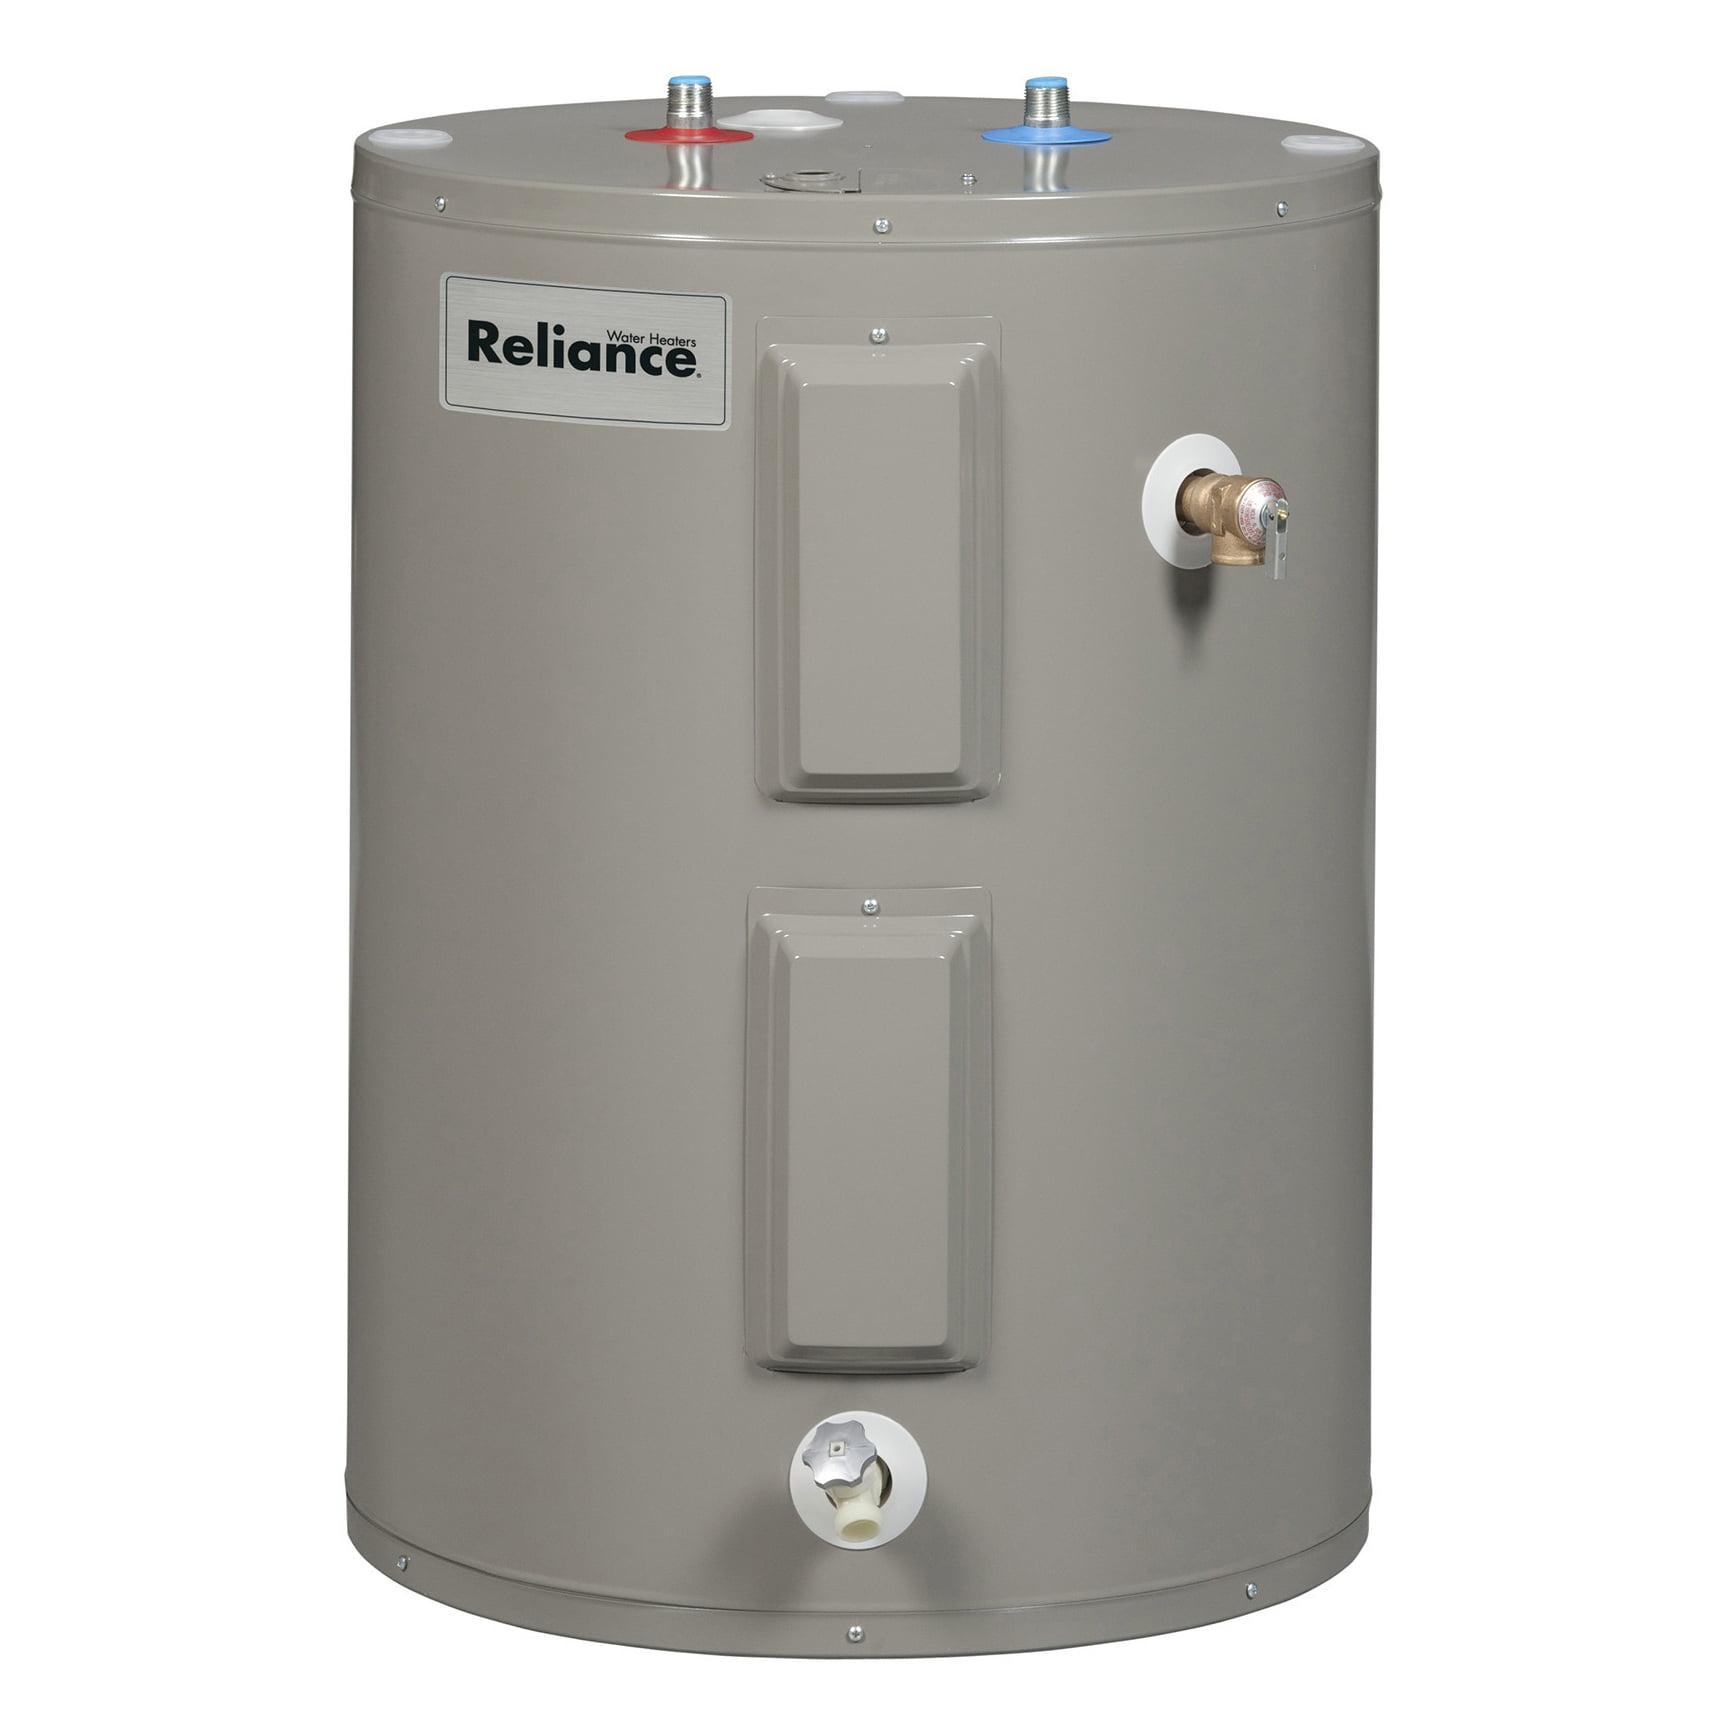 Reliance 6 40 EOLBS 38 Gallon Electric Low Boy Water Heater